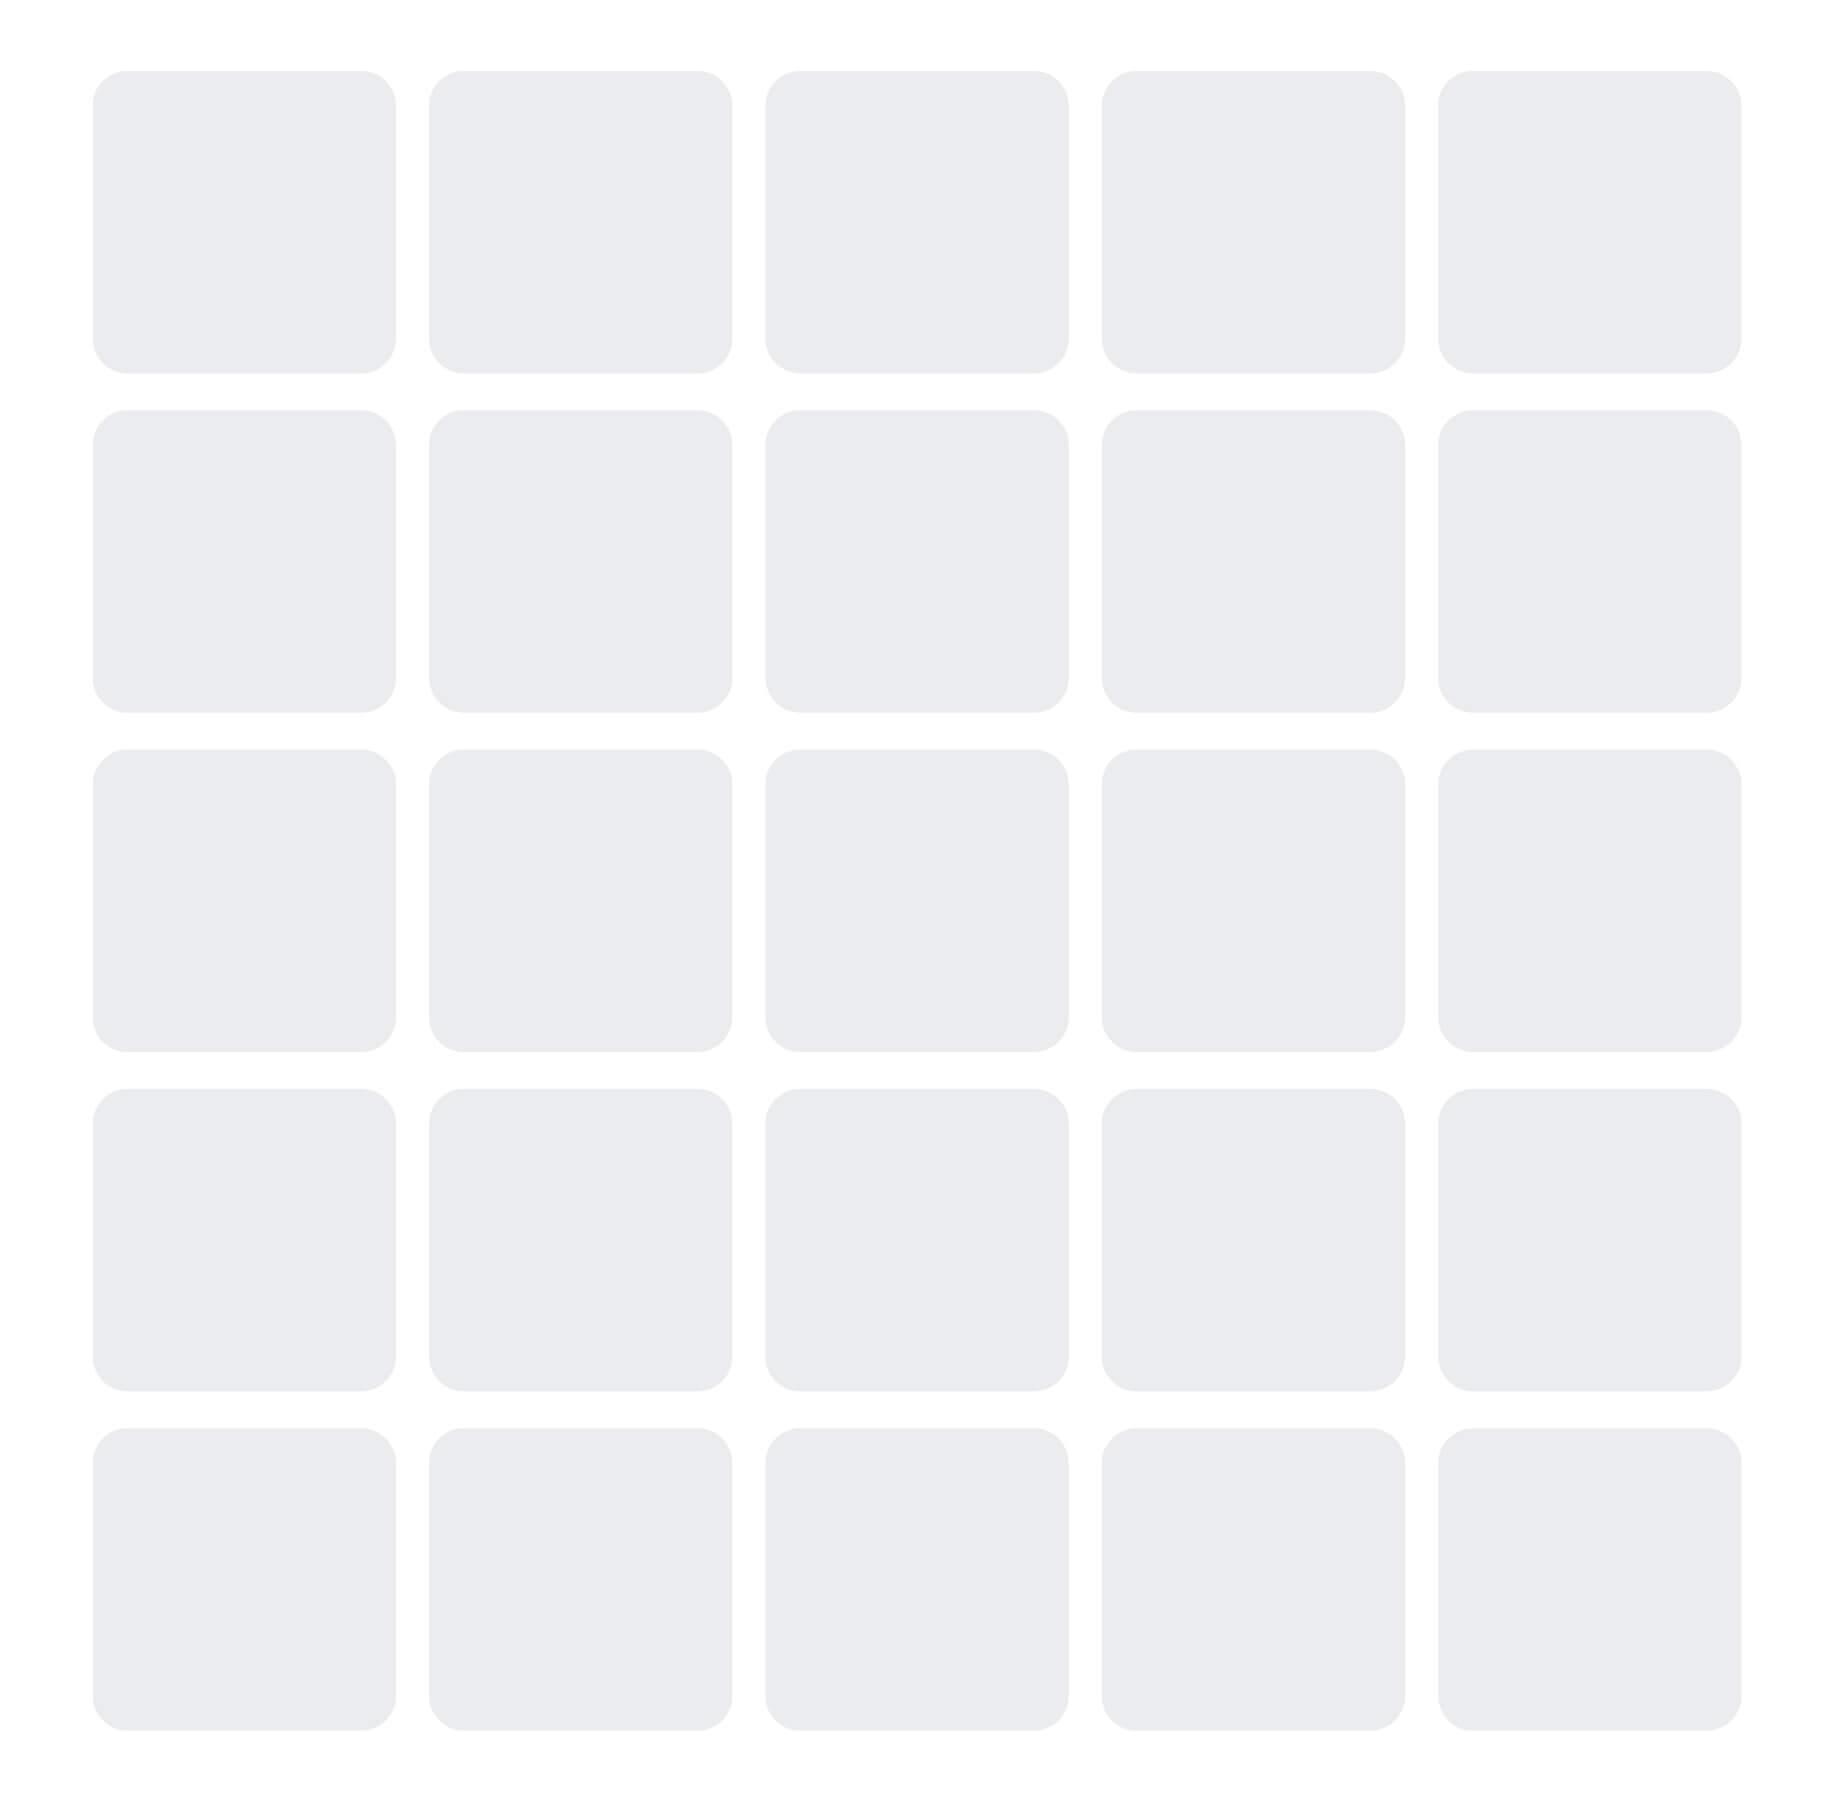 Gray squares